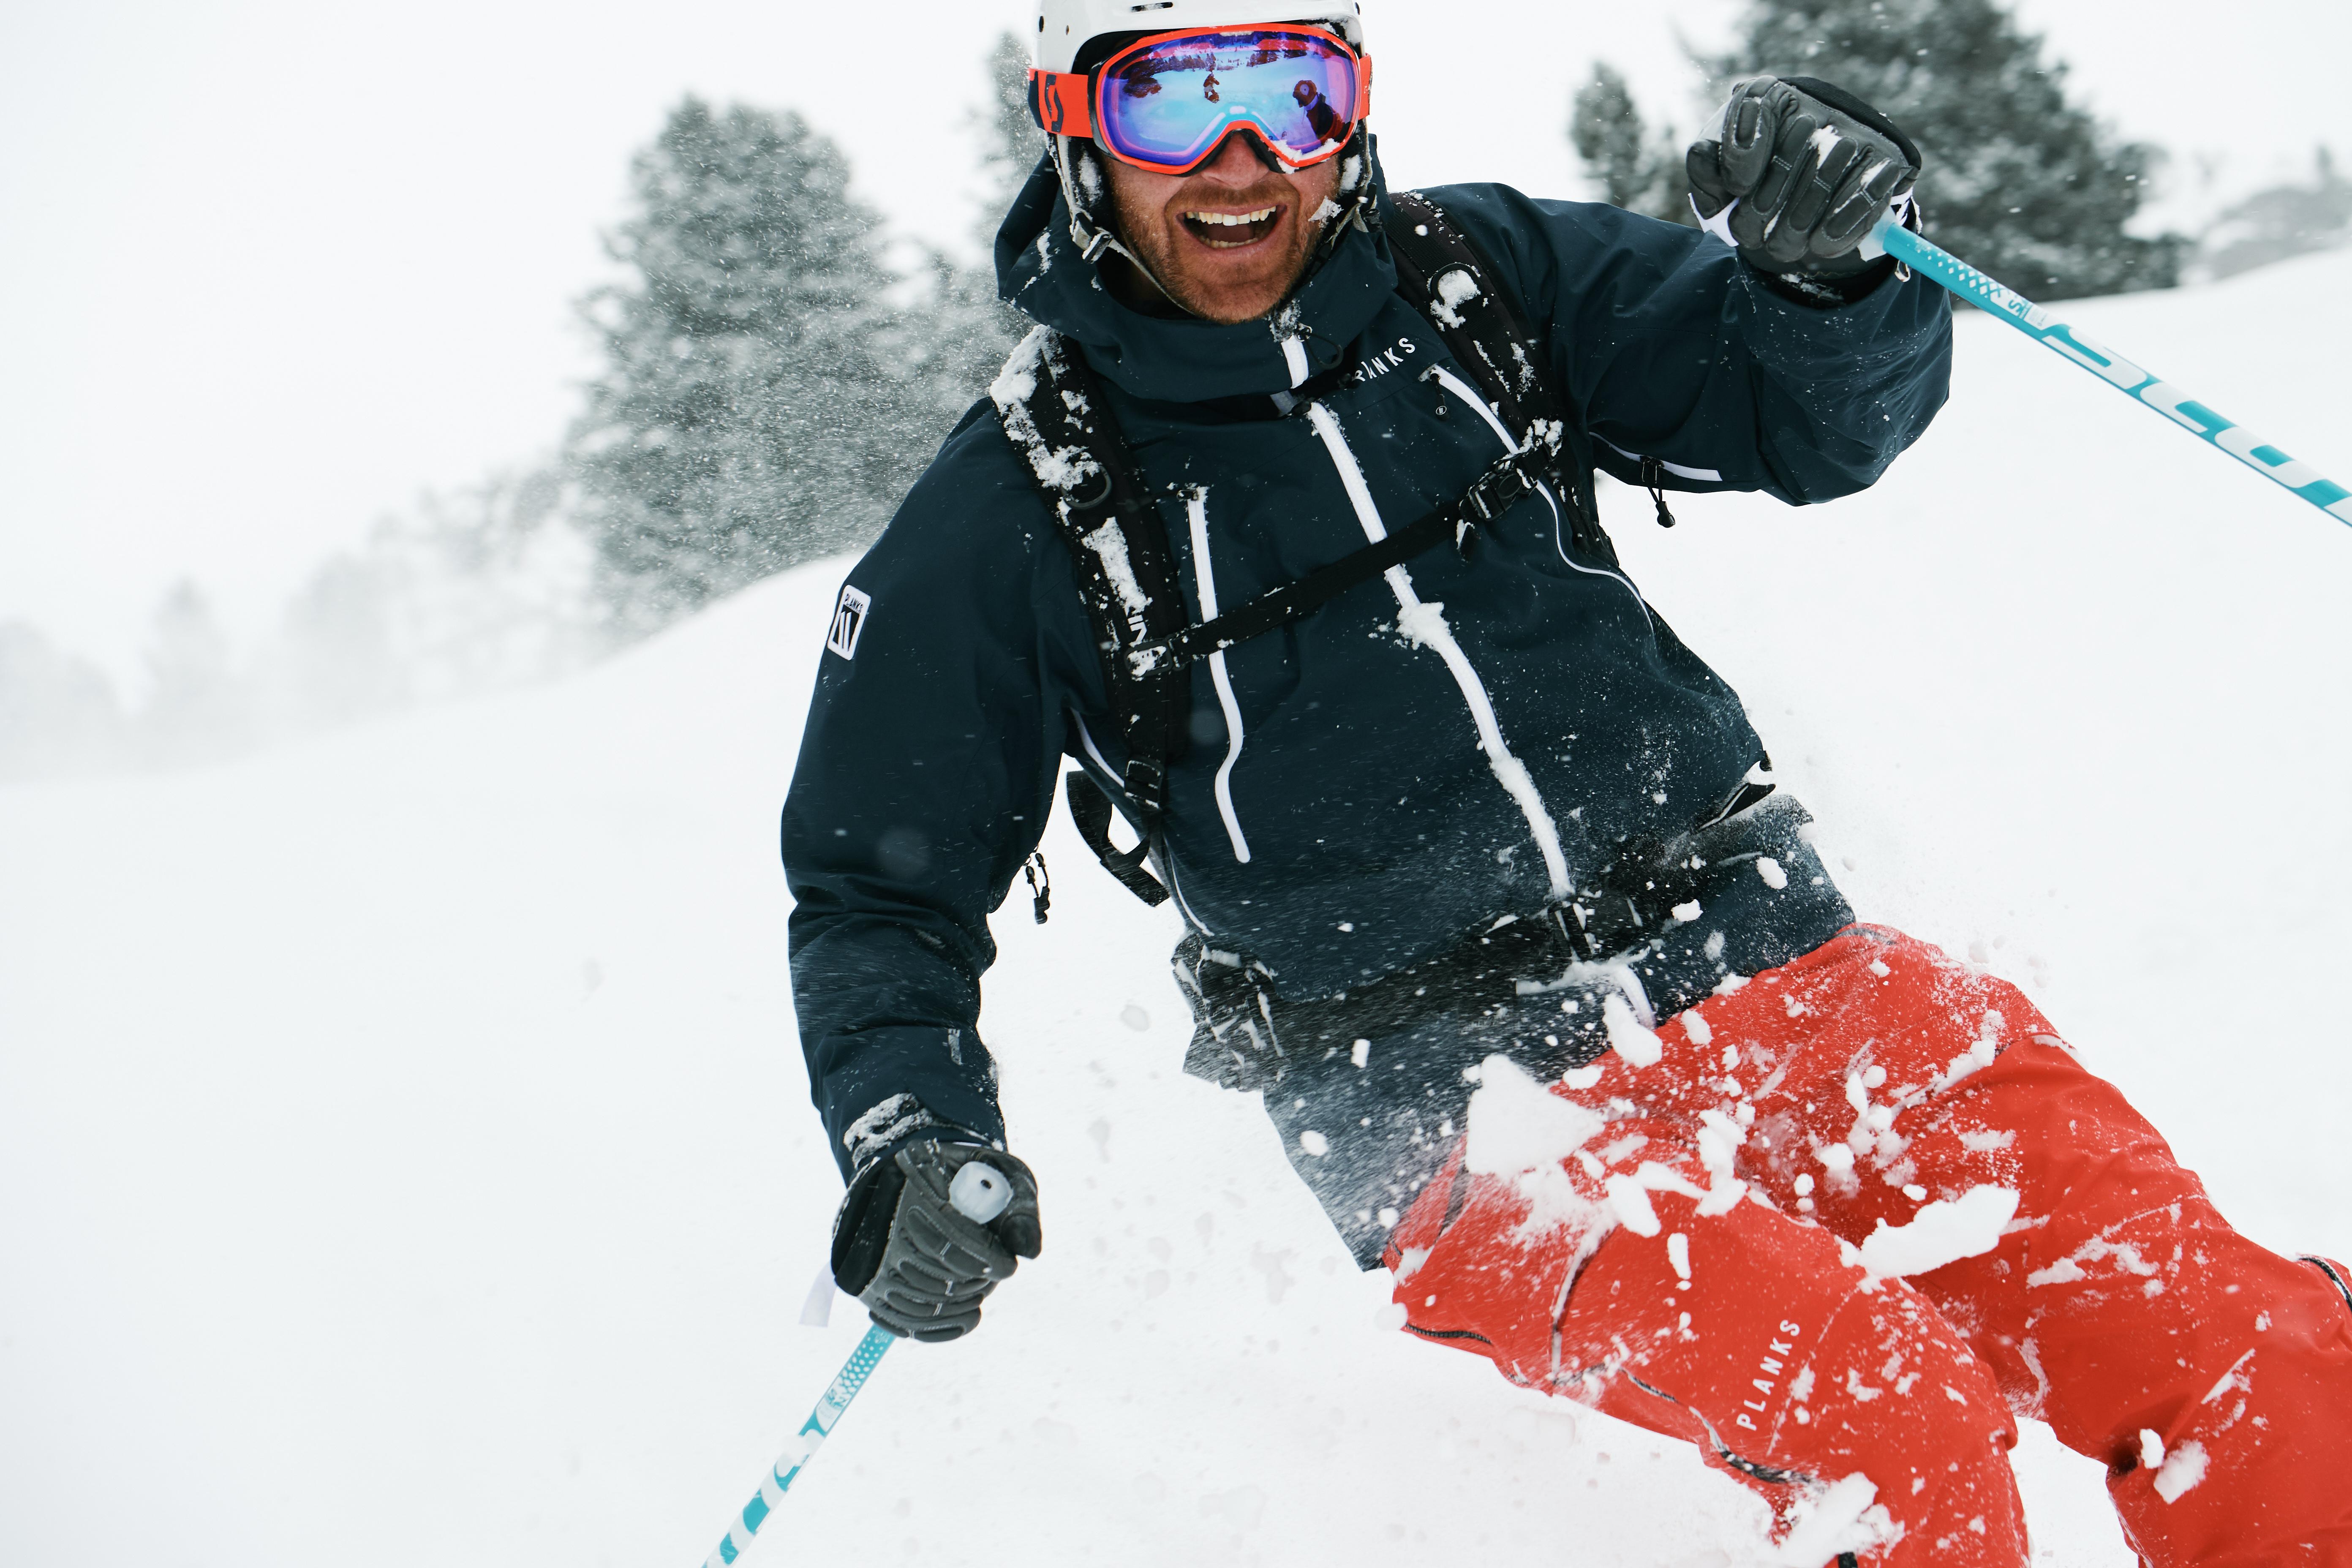 10c47954e4 Ski Jacket Buying Guide - Ski Club of Great Britain